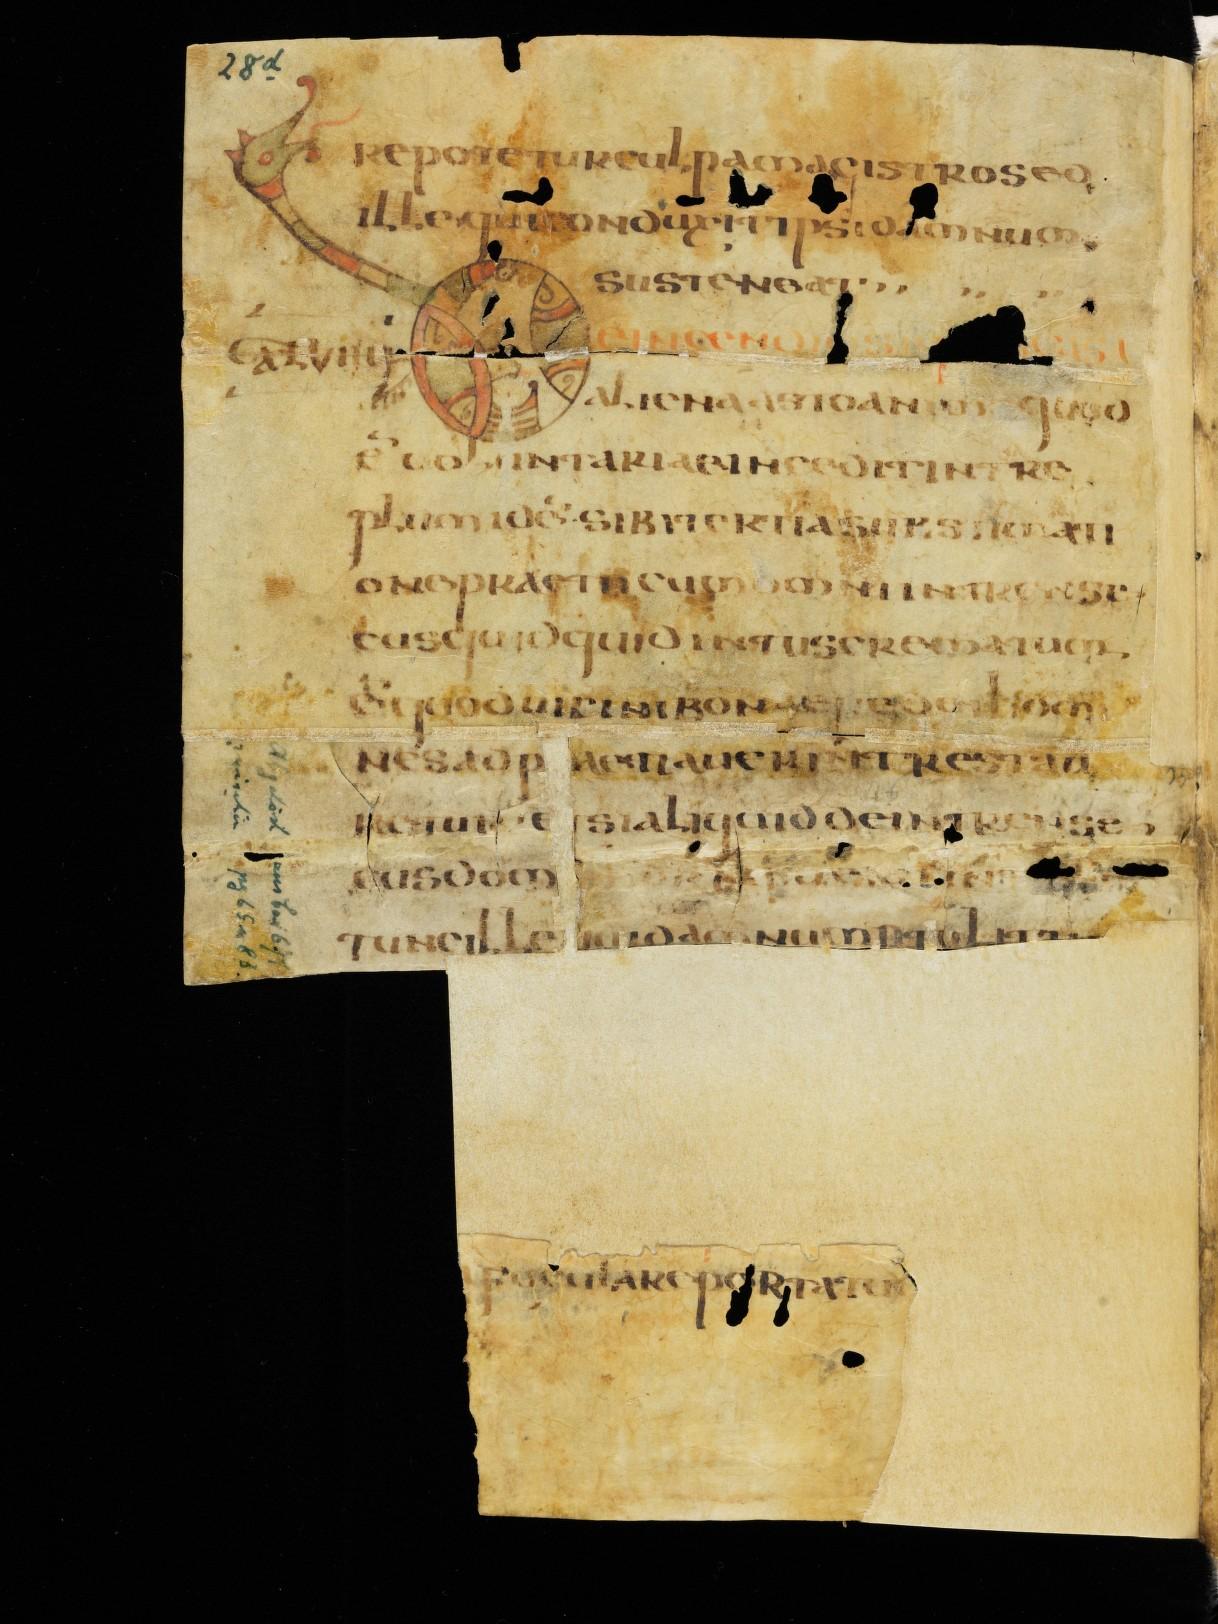 Cod. Sang. 730, p. 28d